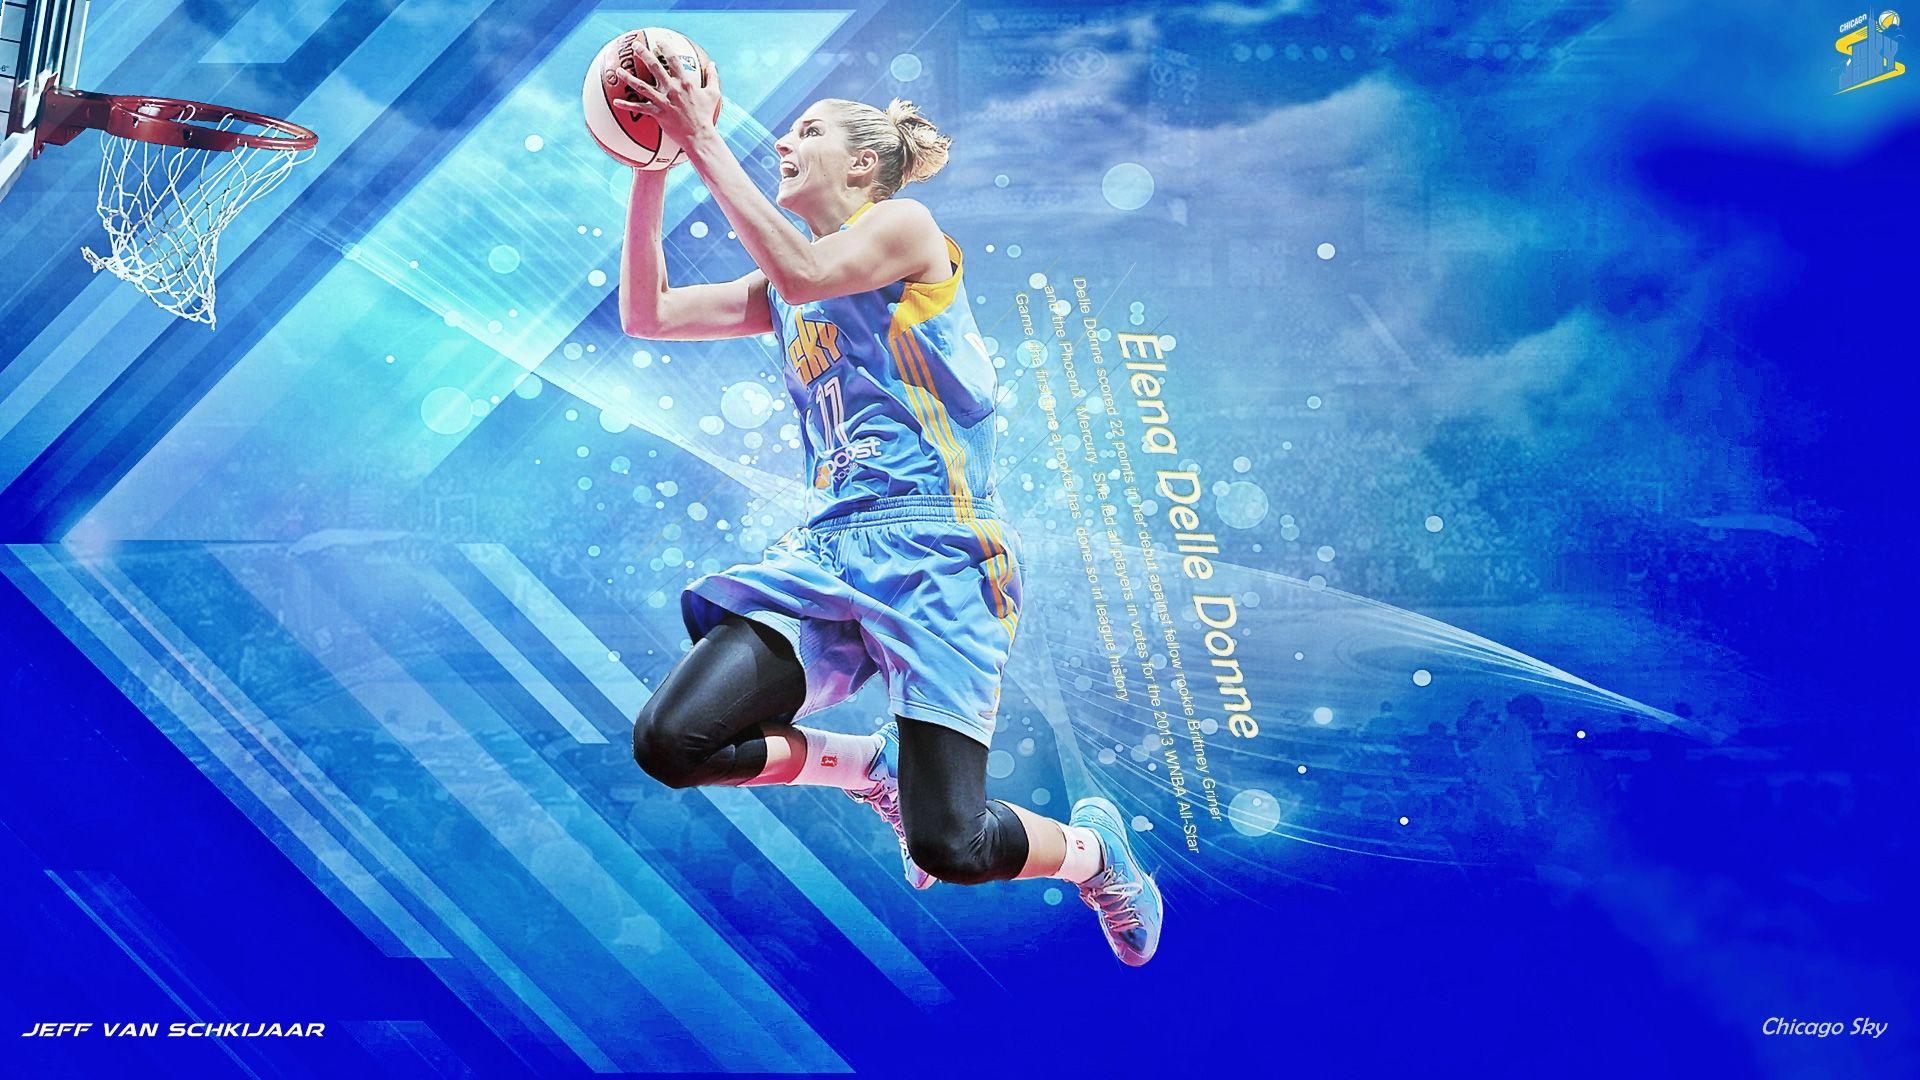 WNBA Wallpapers Basketball Wallpapers at HD Wallpapers